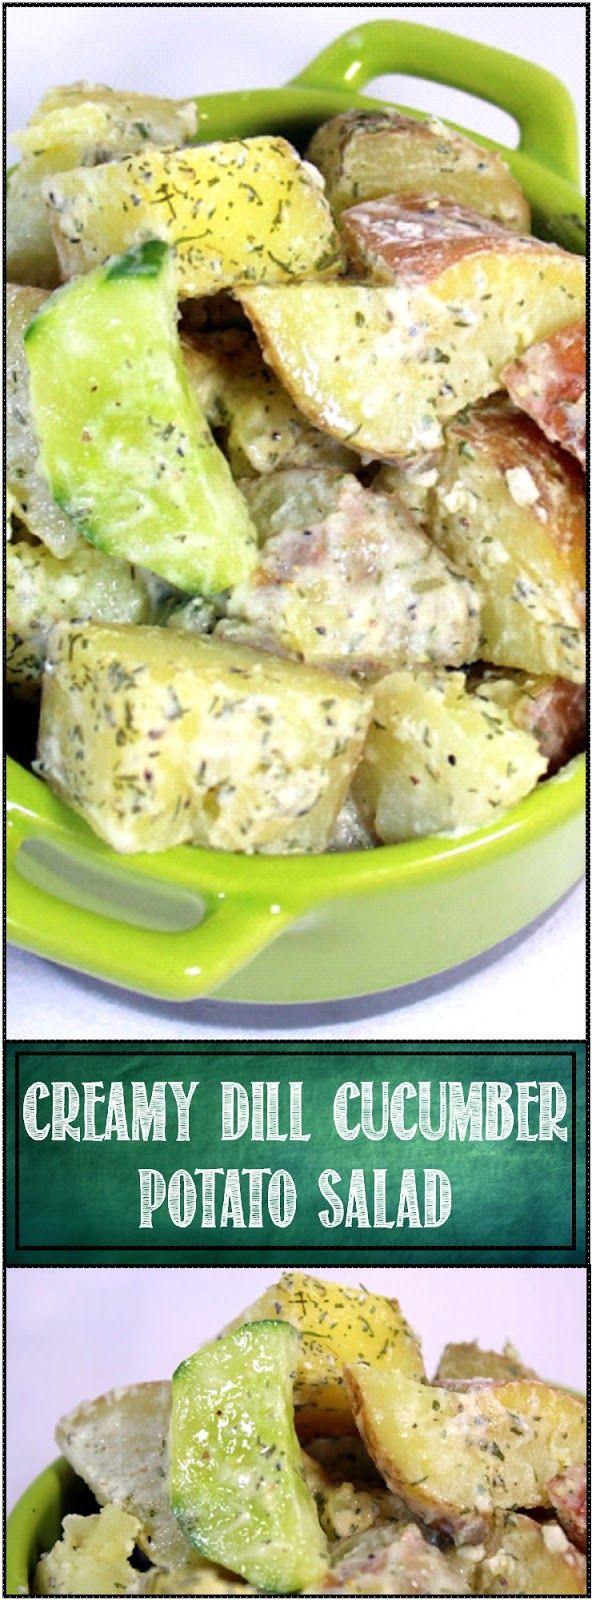 Creamy Dill Cucumber And Potato Salad